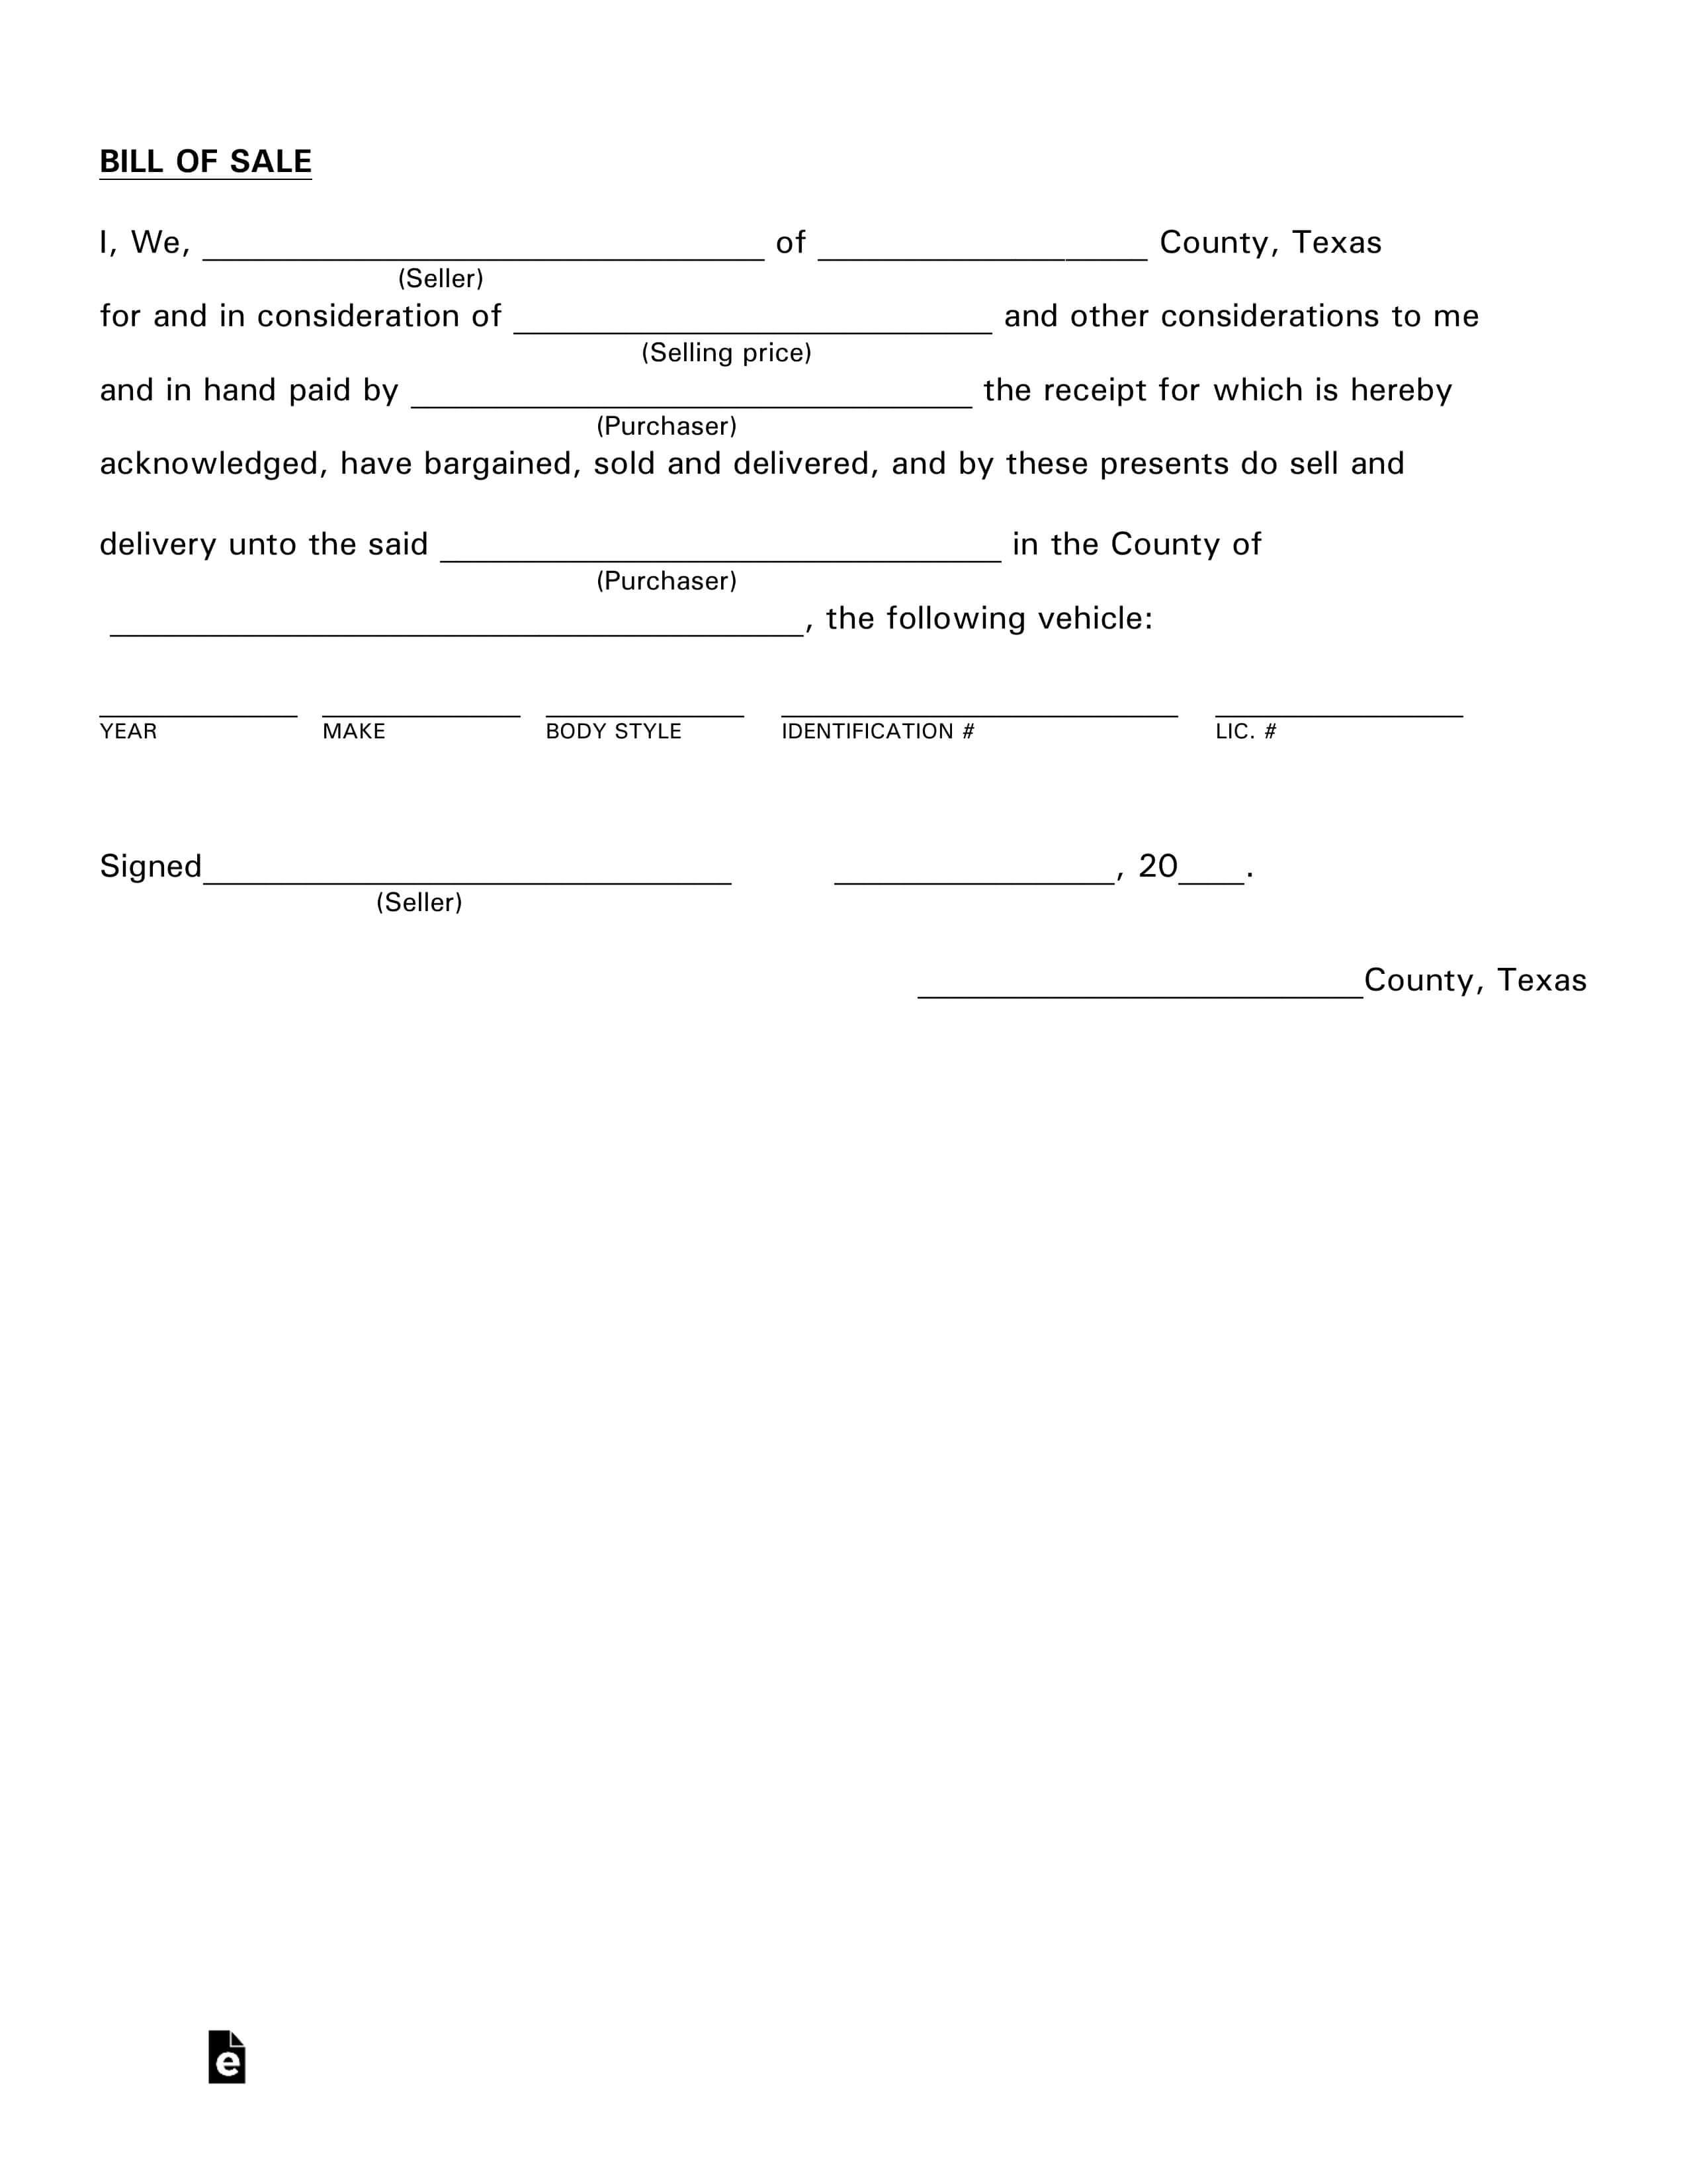 017 Template Ideas Texas Vehicle Bill Of Sale Dreaded for Vehicle Bill Of Sale Template Word